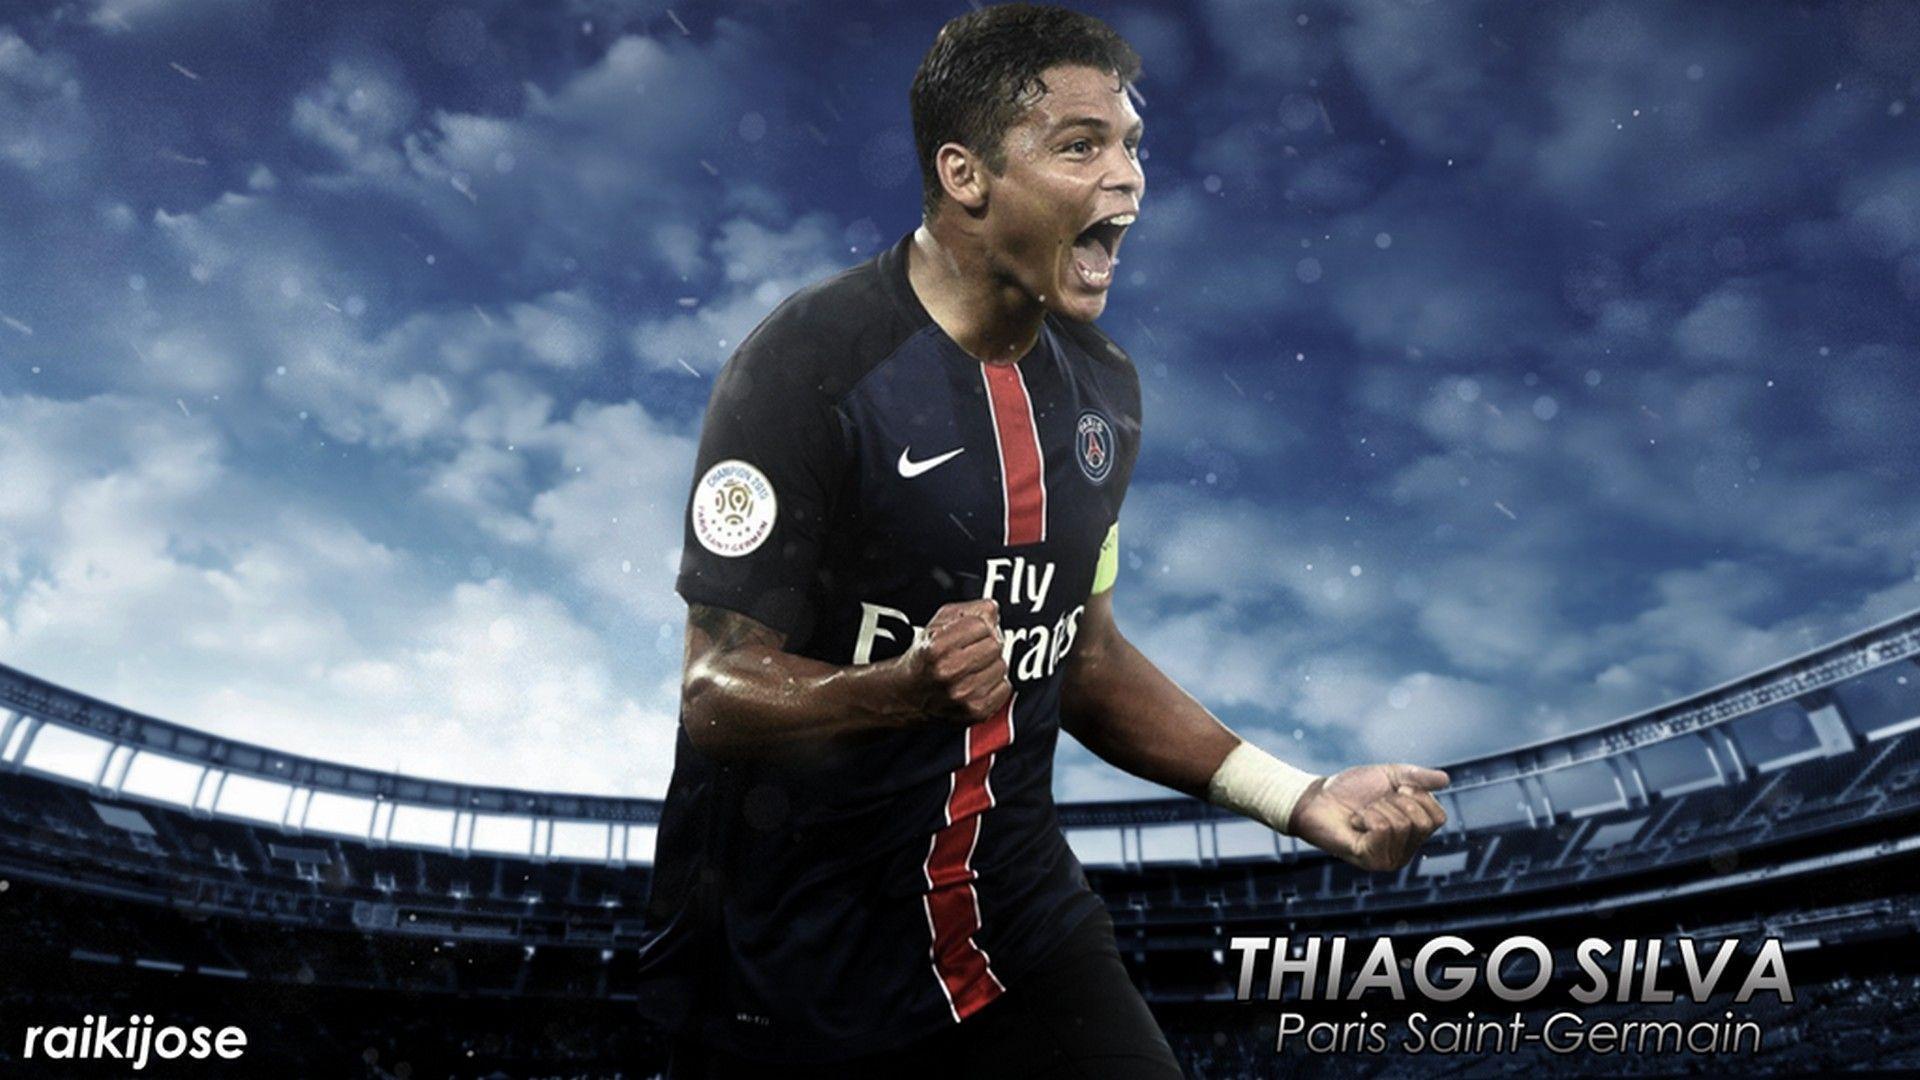 Thiago Silva Wallpapers